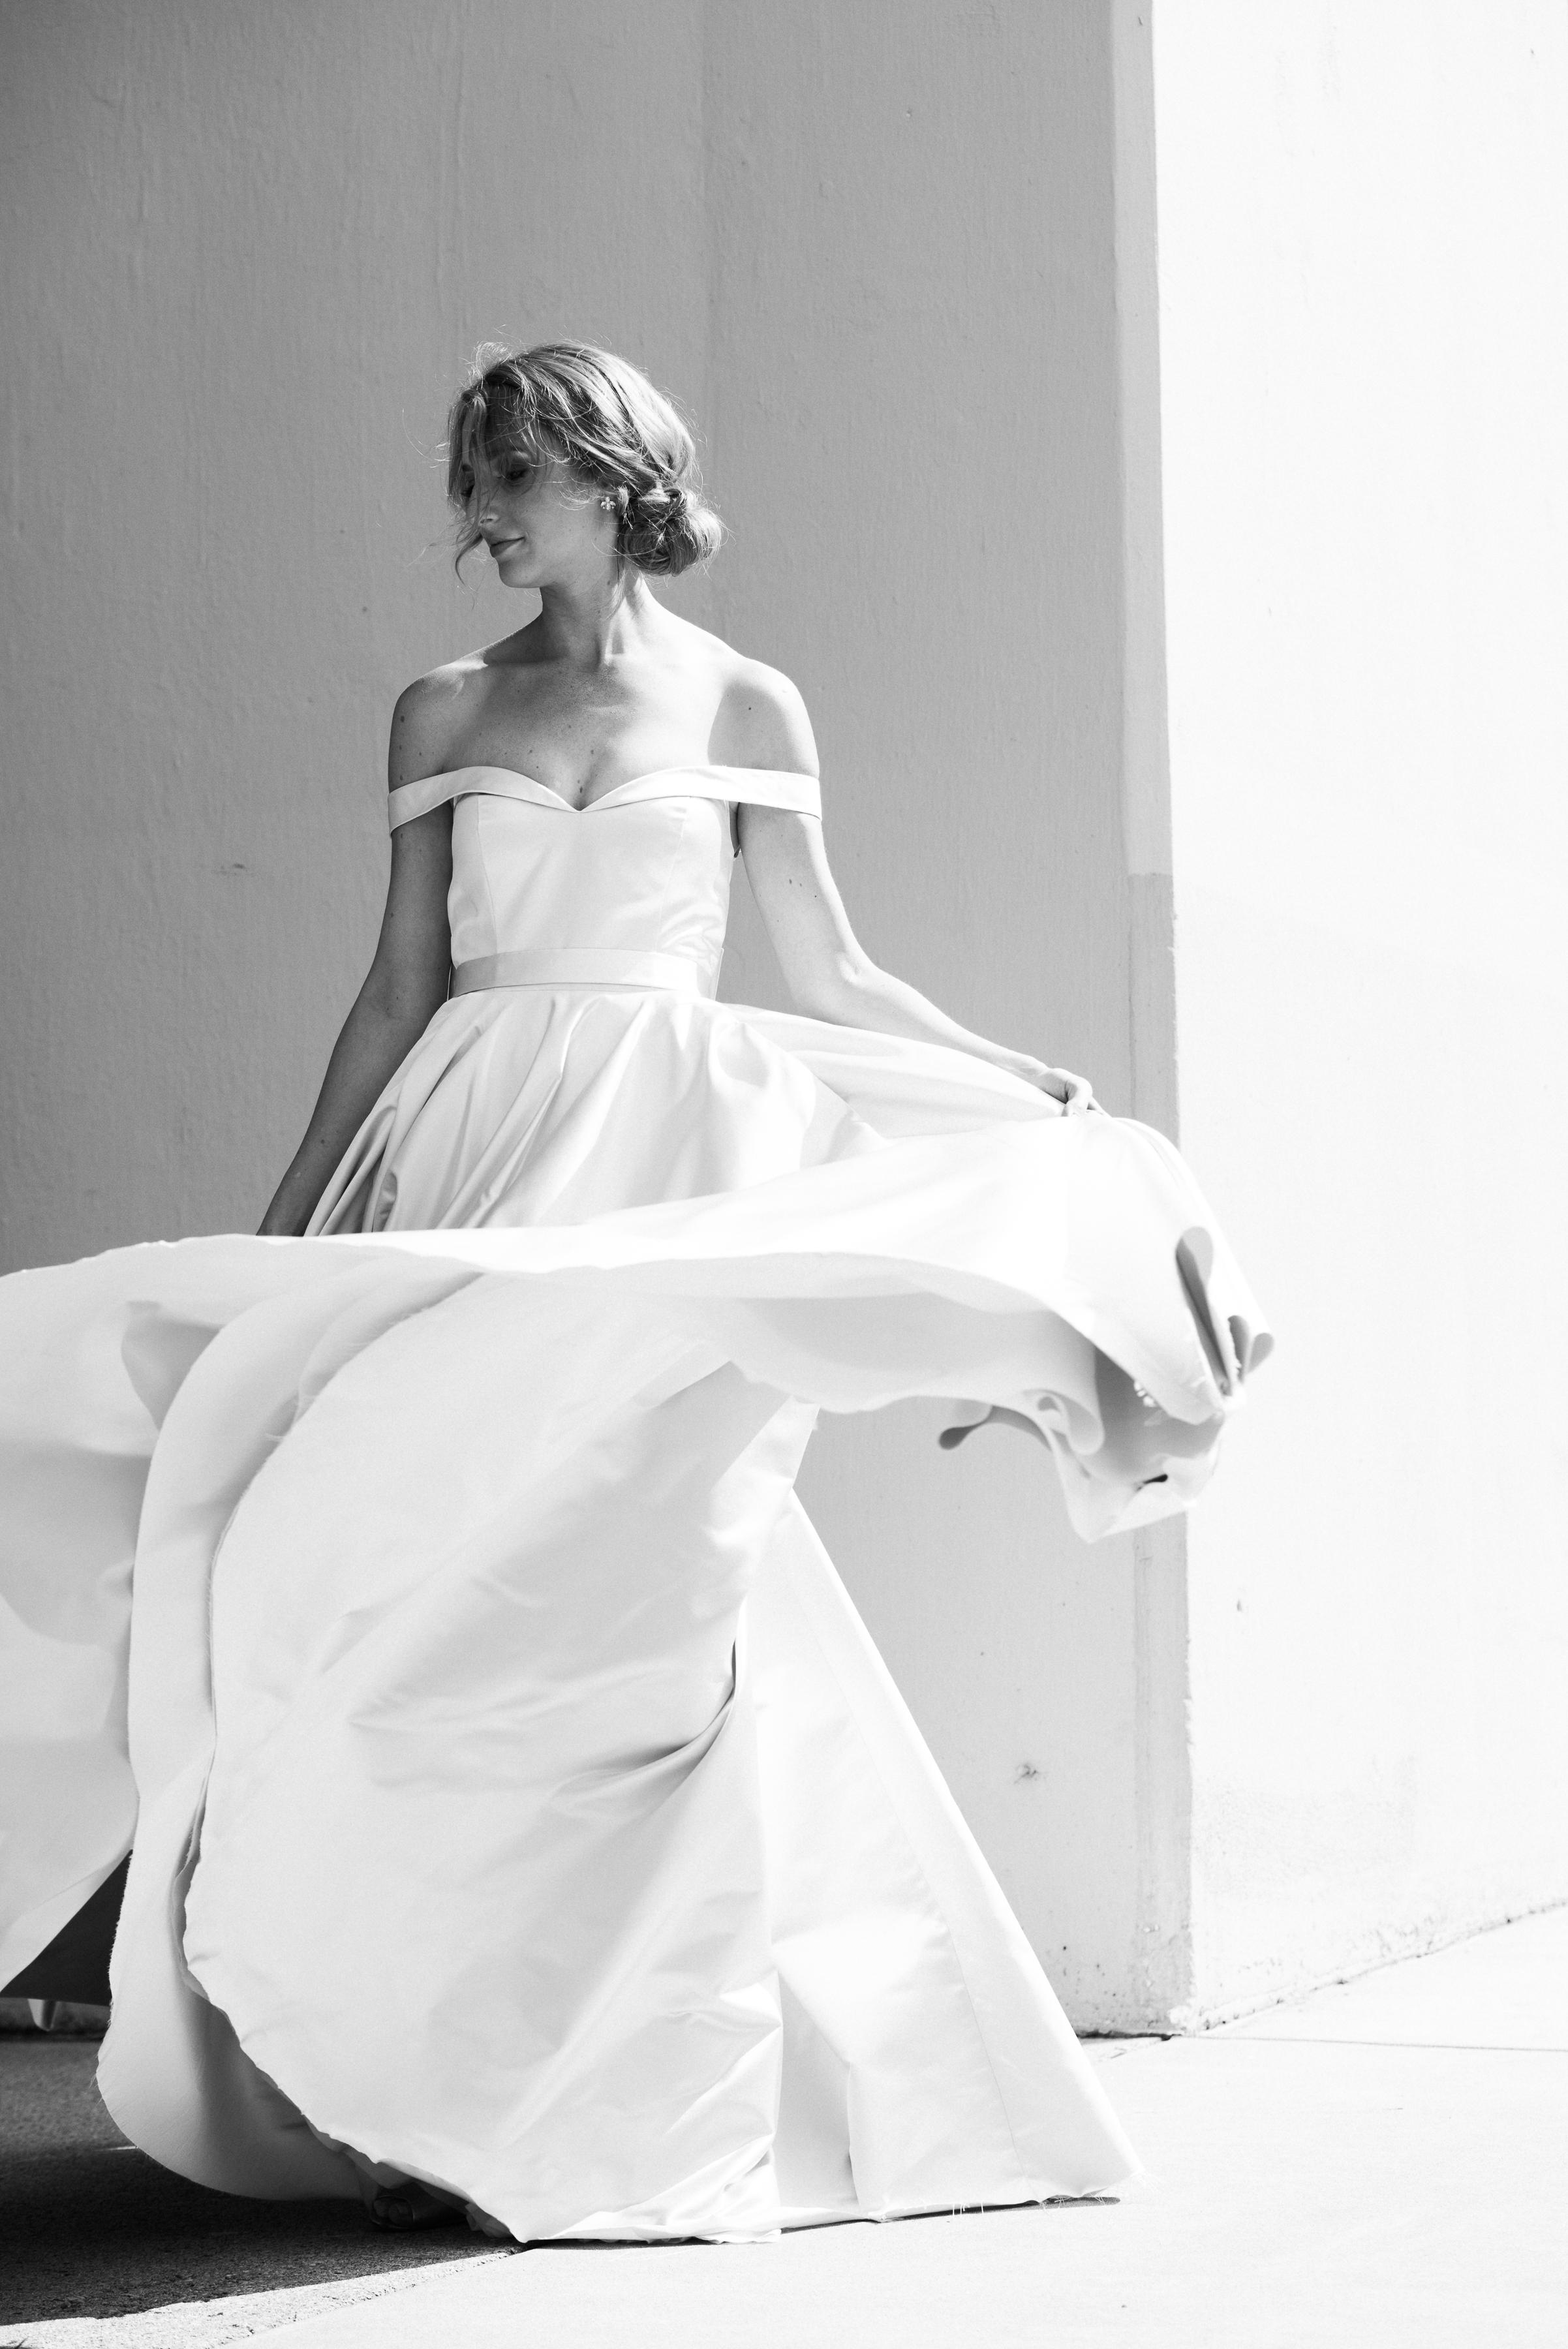 St Louis Couture Werdding Dress